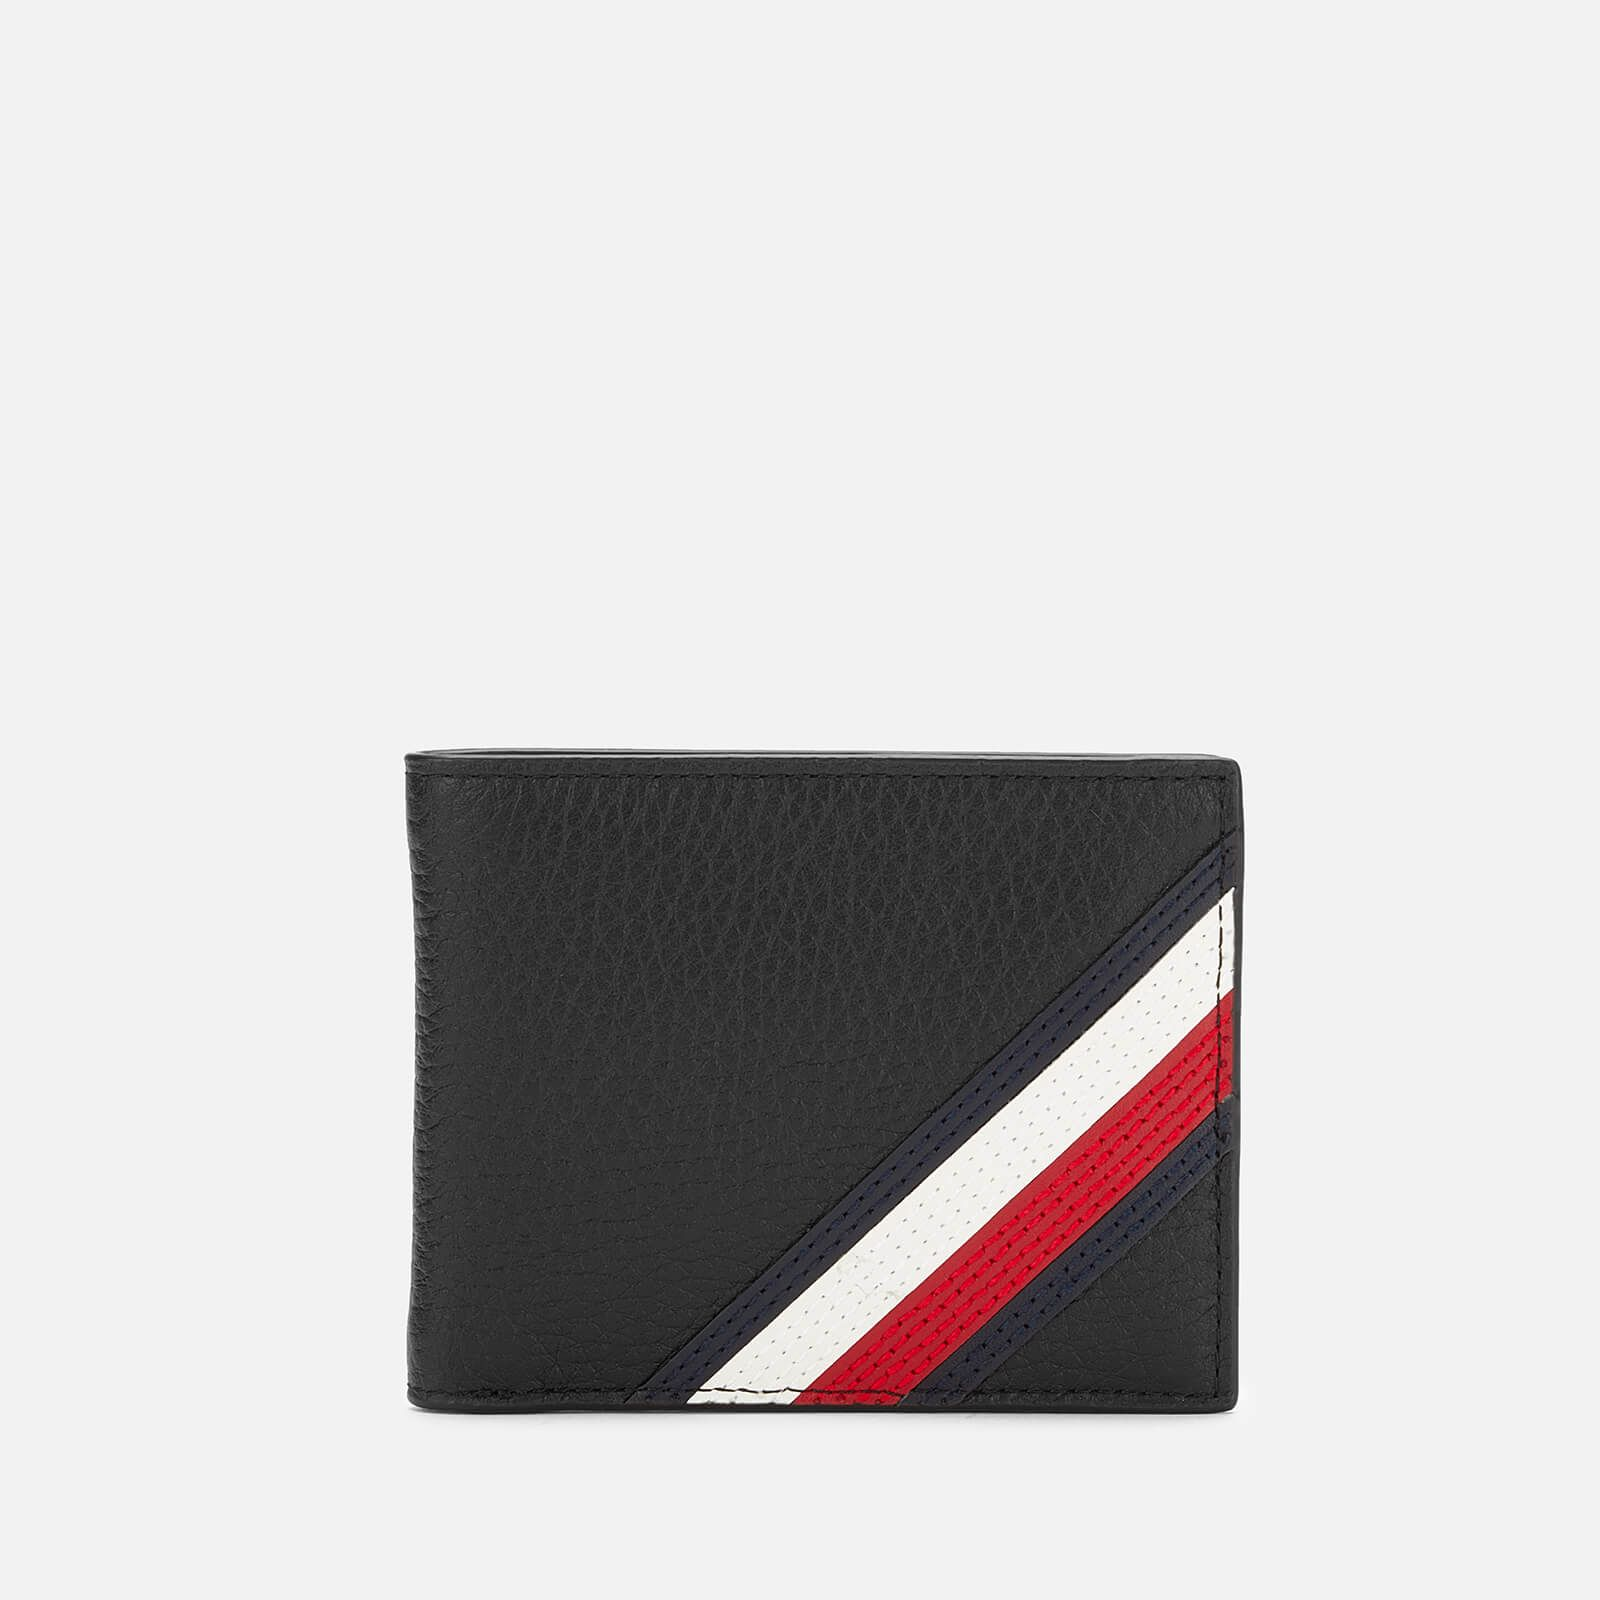 Tommy Hilfiger Men's Downtown Mini Credit Card Wallet - Black #sponse #Ad #Men, #Downtown, #Tommy